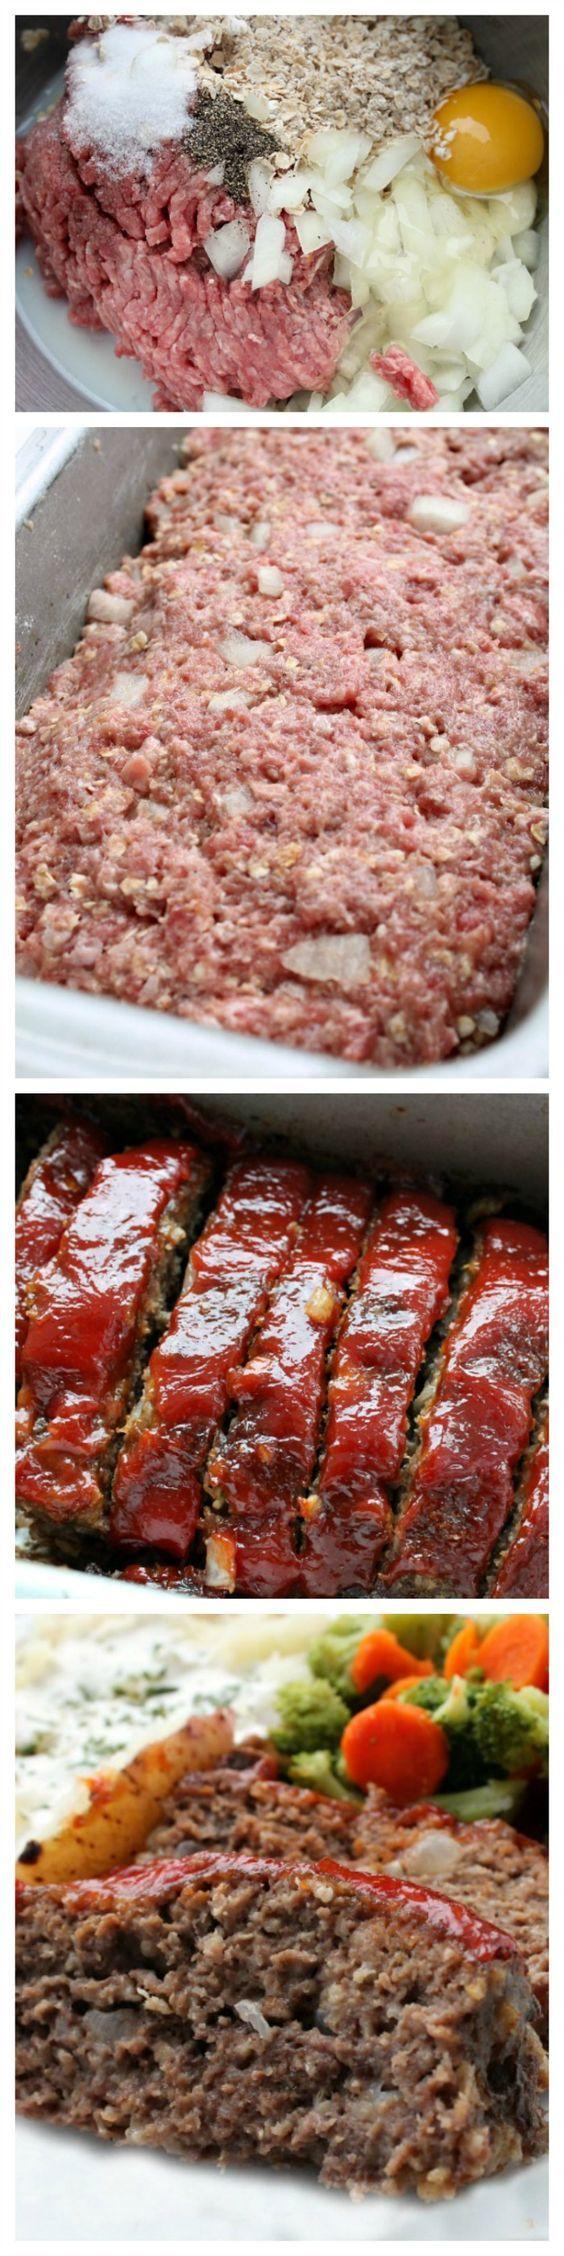 Classic and comforting meatloaf recipe...just like mom used to make. mmm, mmm, mmm! via @reallifedinner